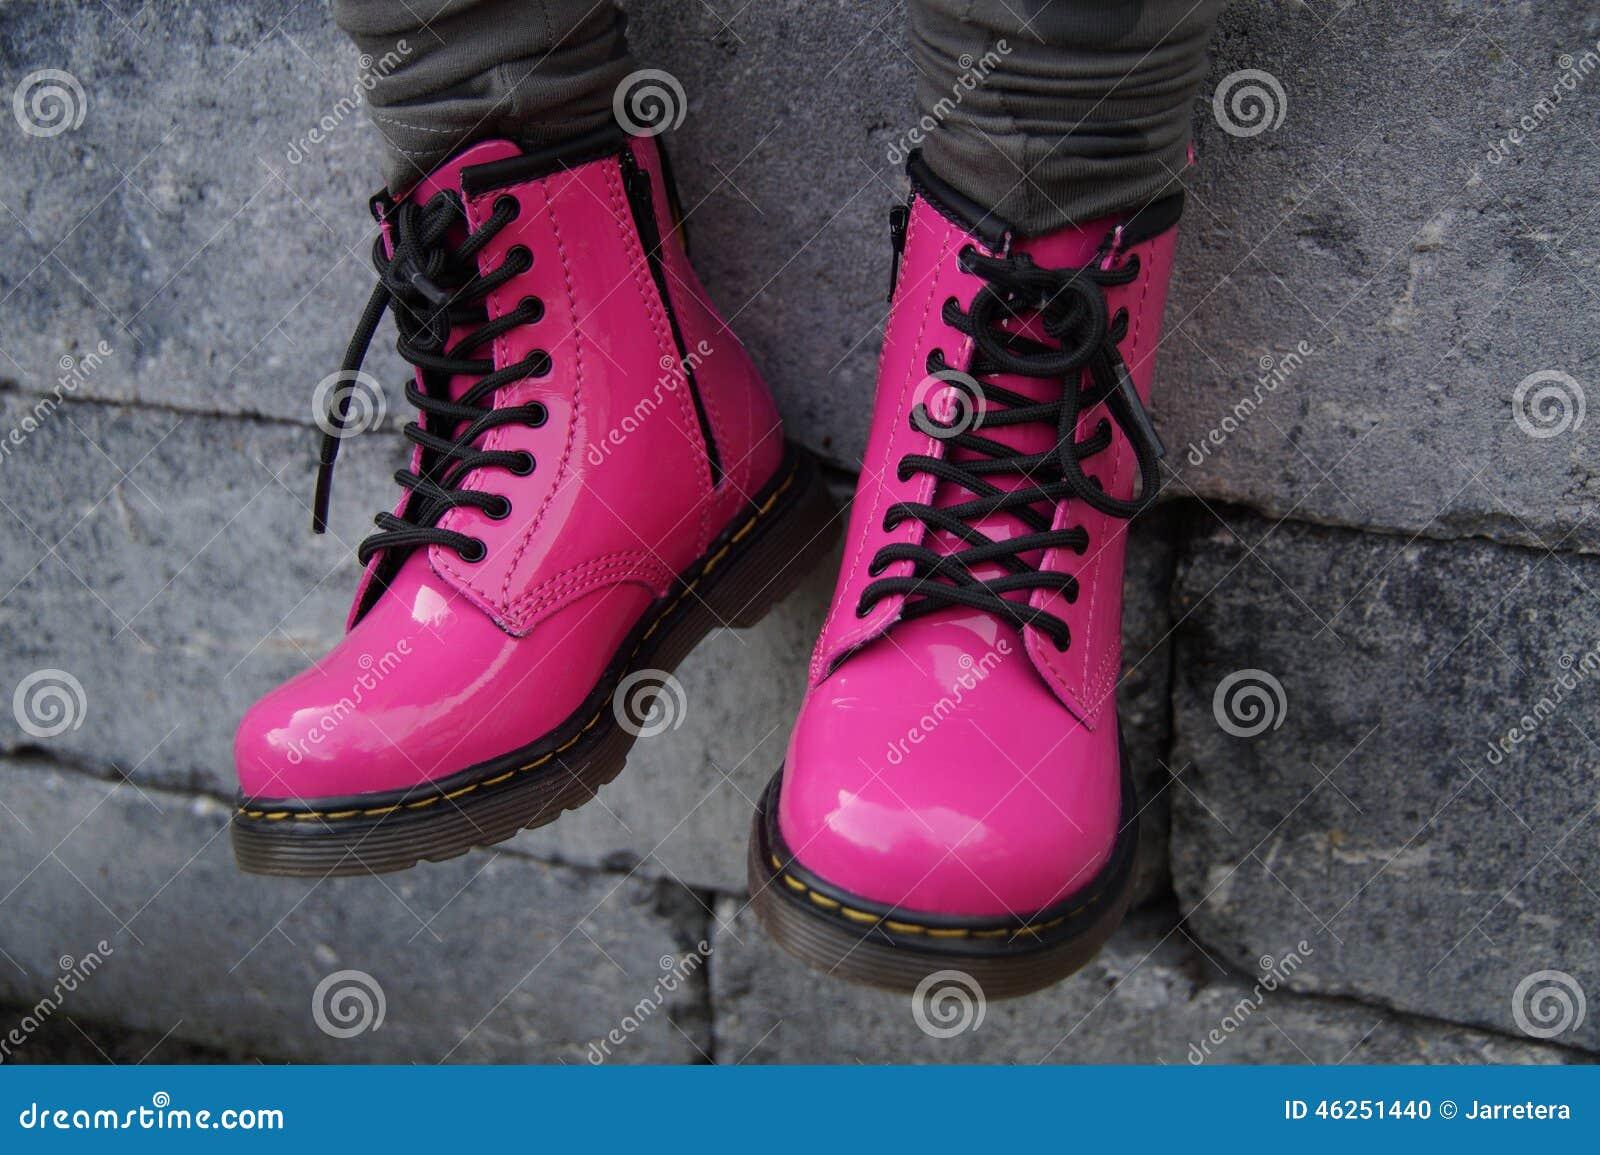 Pink punk alternative girl or woman shoes - sitting tough